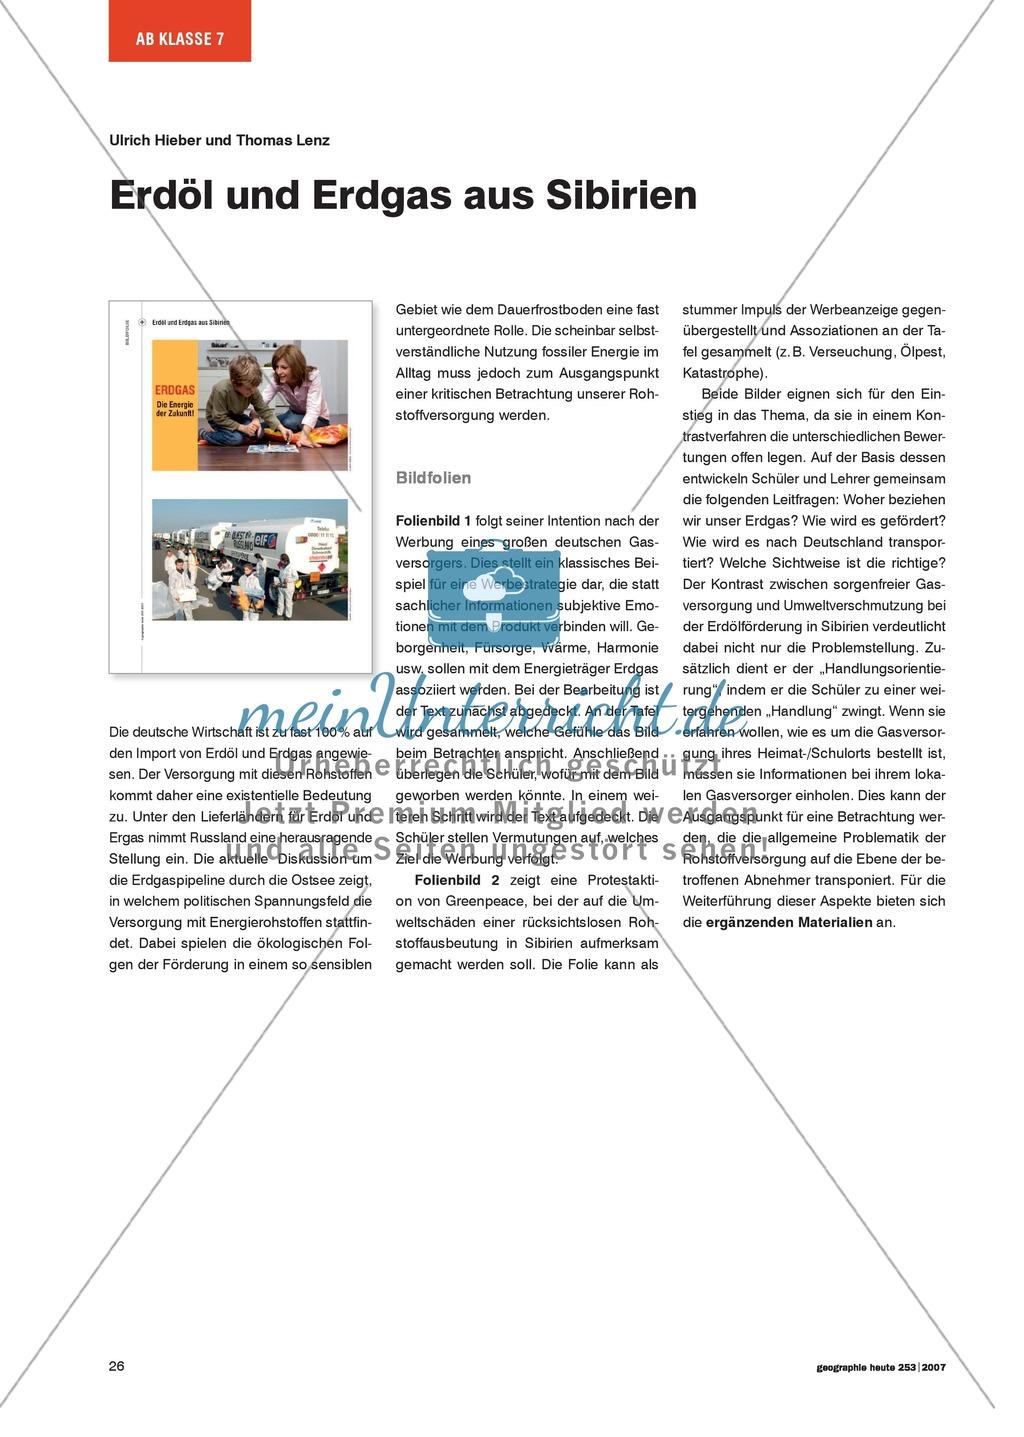 Bilder lesen lernen: Erdöl + Erdgas aus Sibirien Preview 0